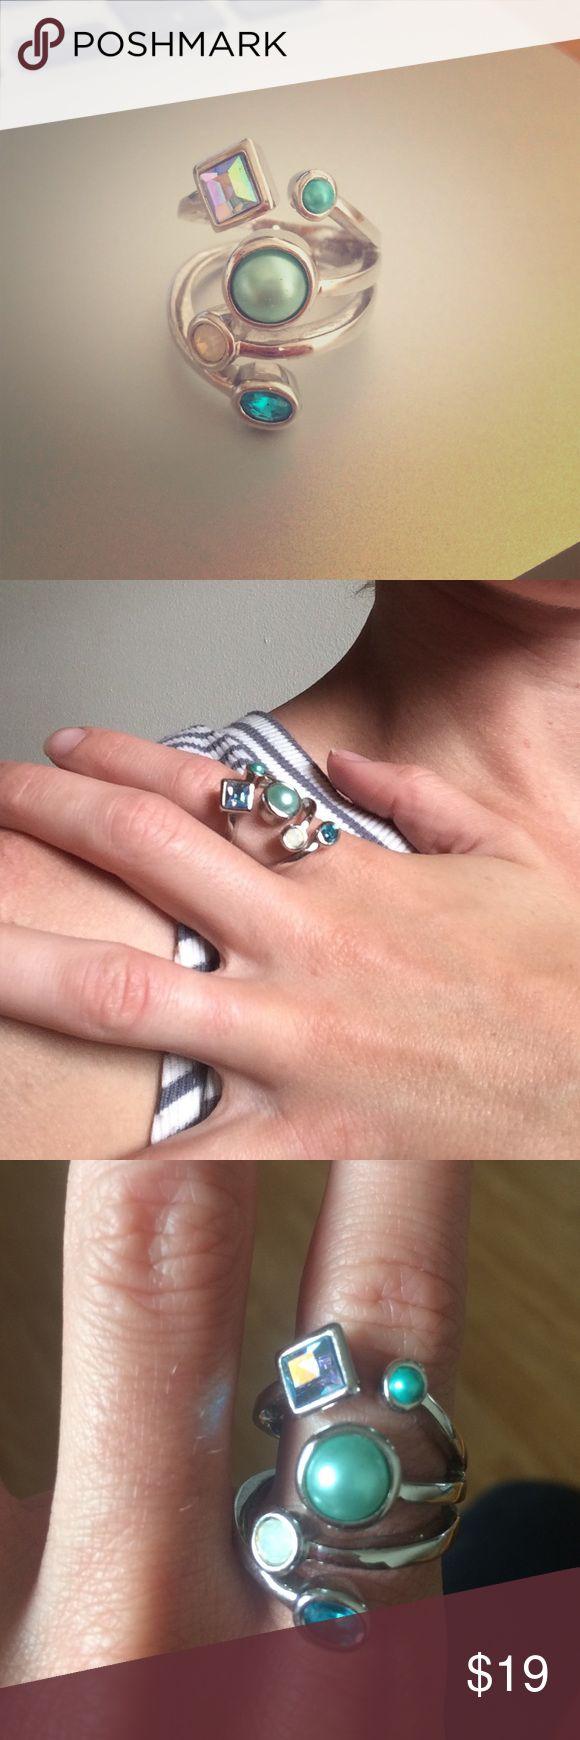 "Lia Sophia ""Comet"" Ring Beautiful ""Comet"" ring from Lia Sophia's last ever catalog. Size 7. In good condition! Lia Sophia Jewelry Rings"